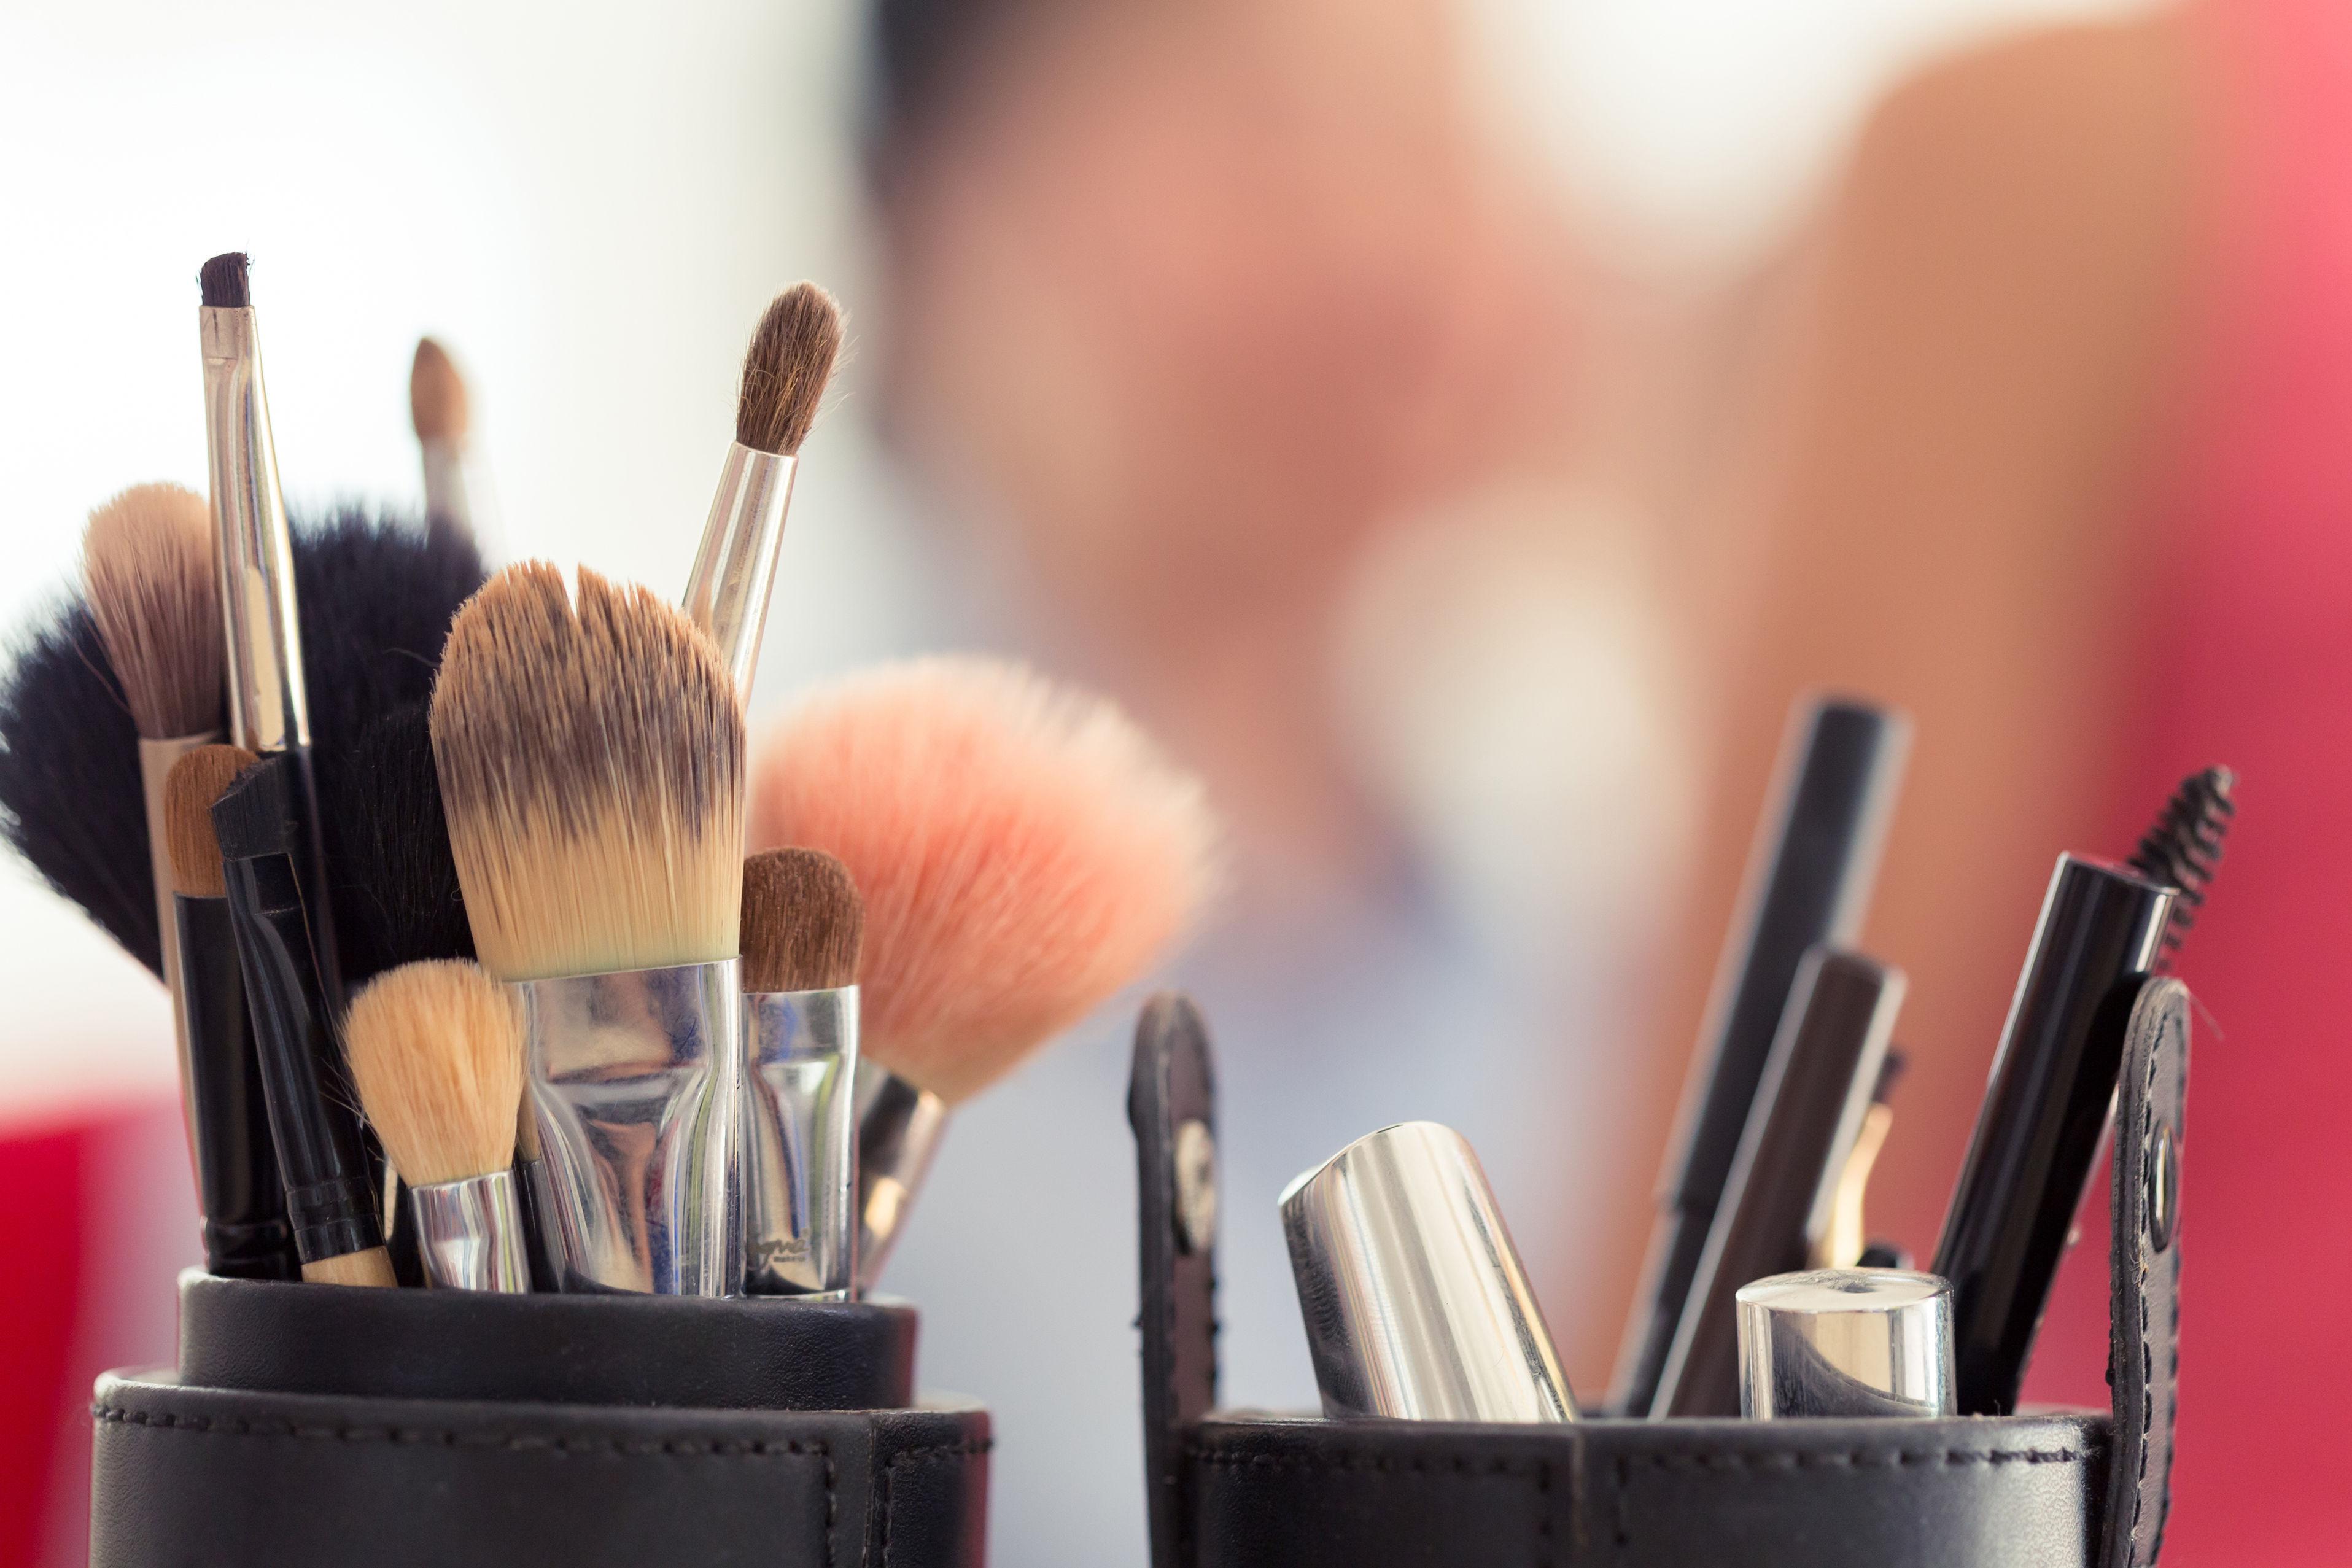 41042667 - sets makeup brush for professional makeup artist